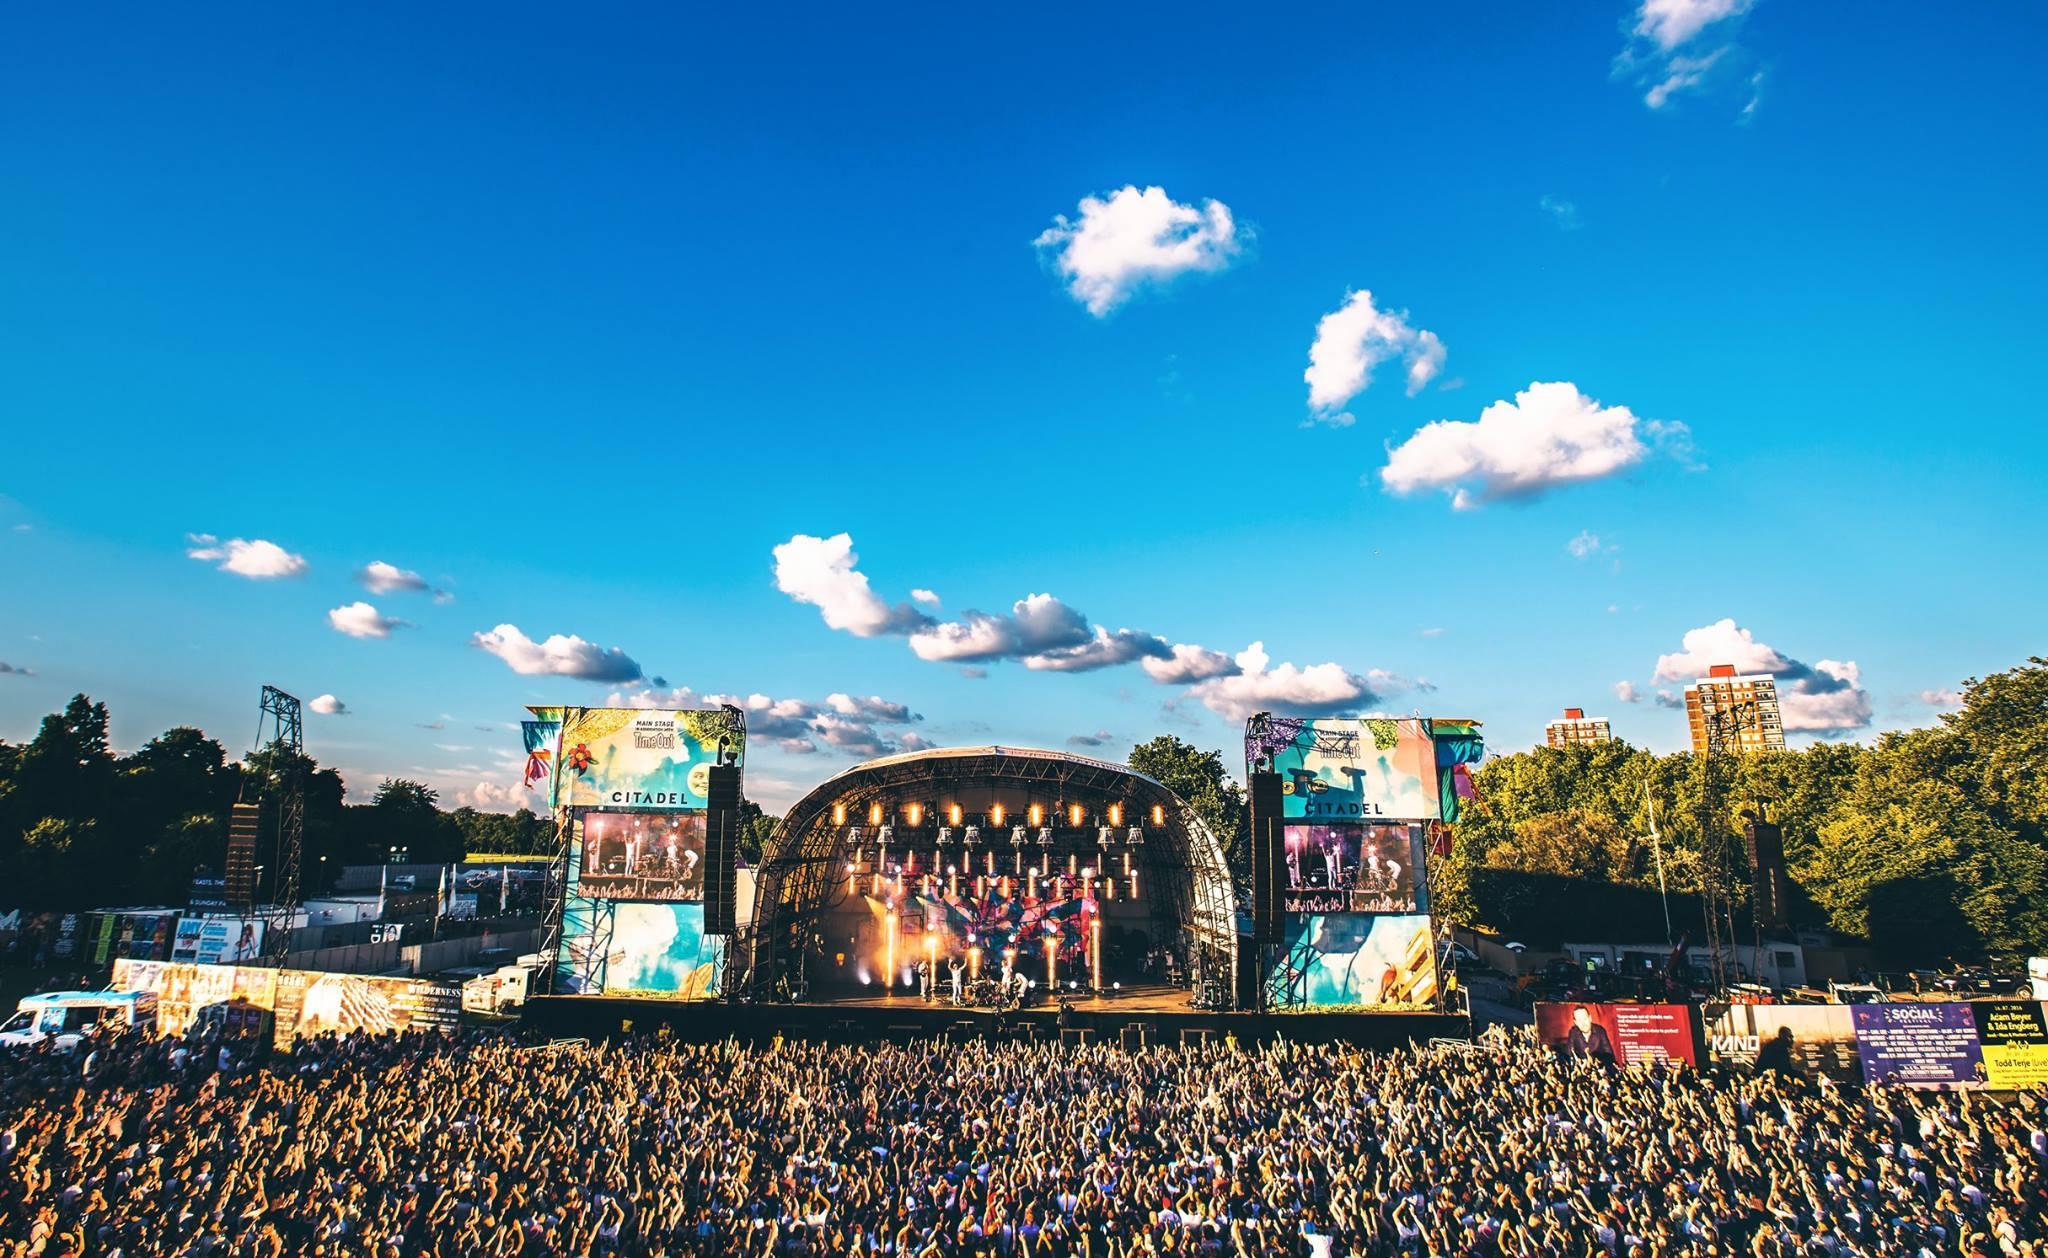 Win tickets to Citadel Festival 2017